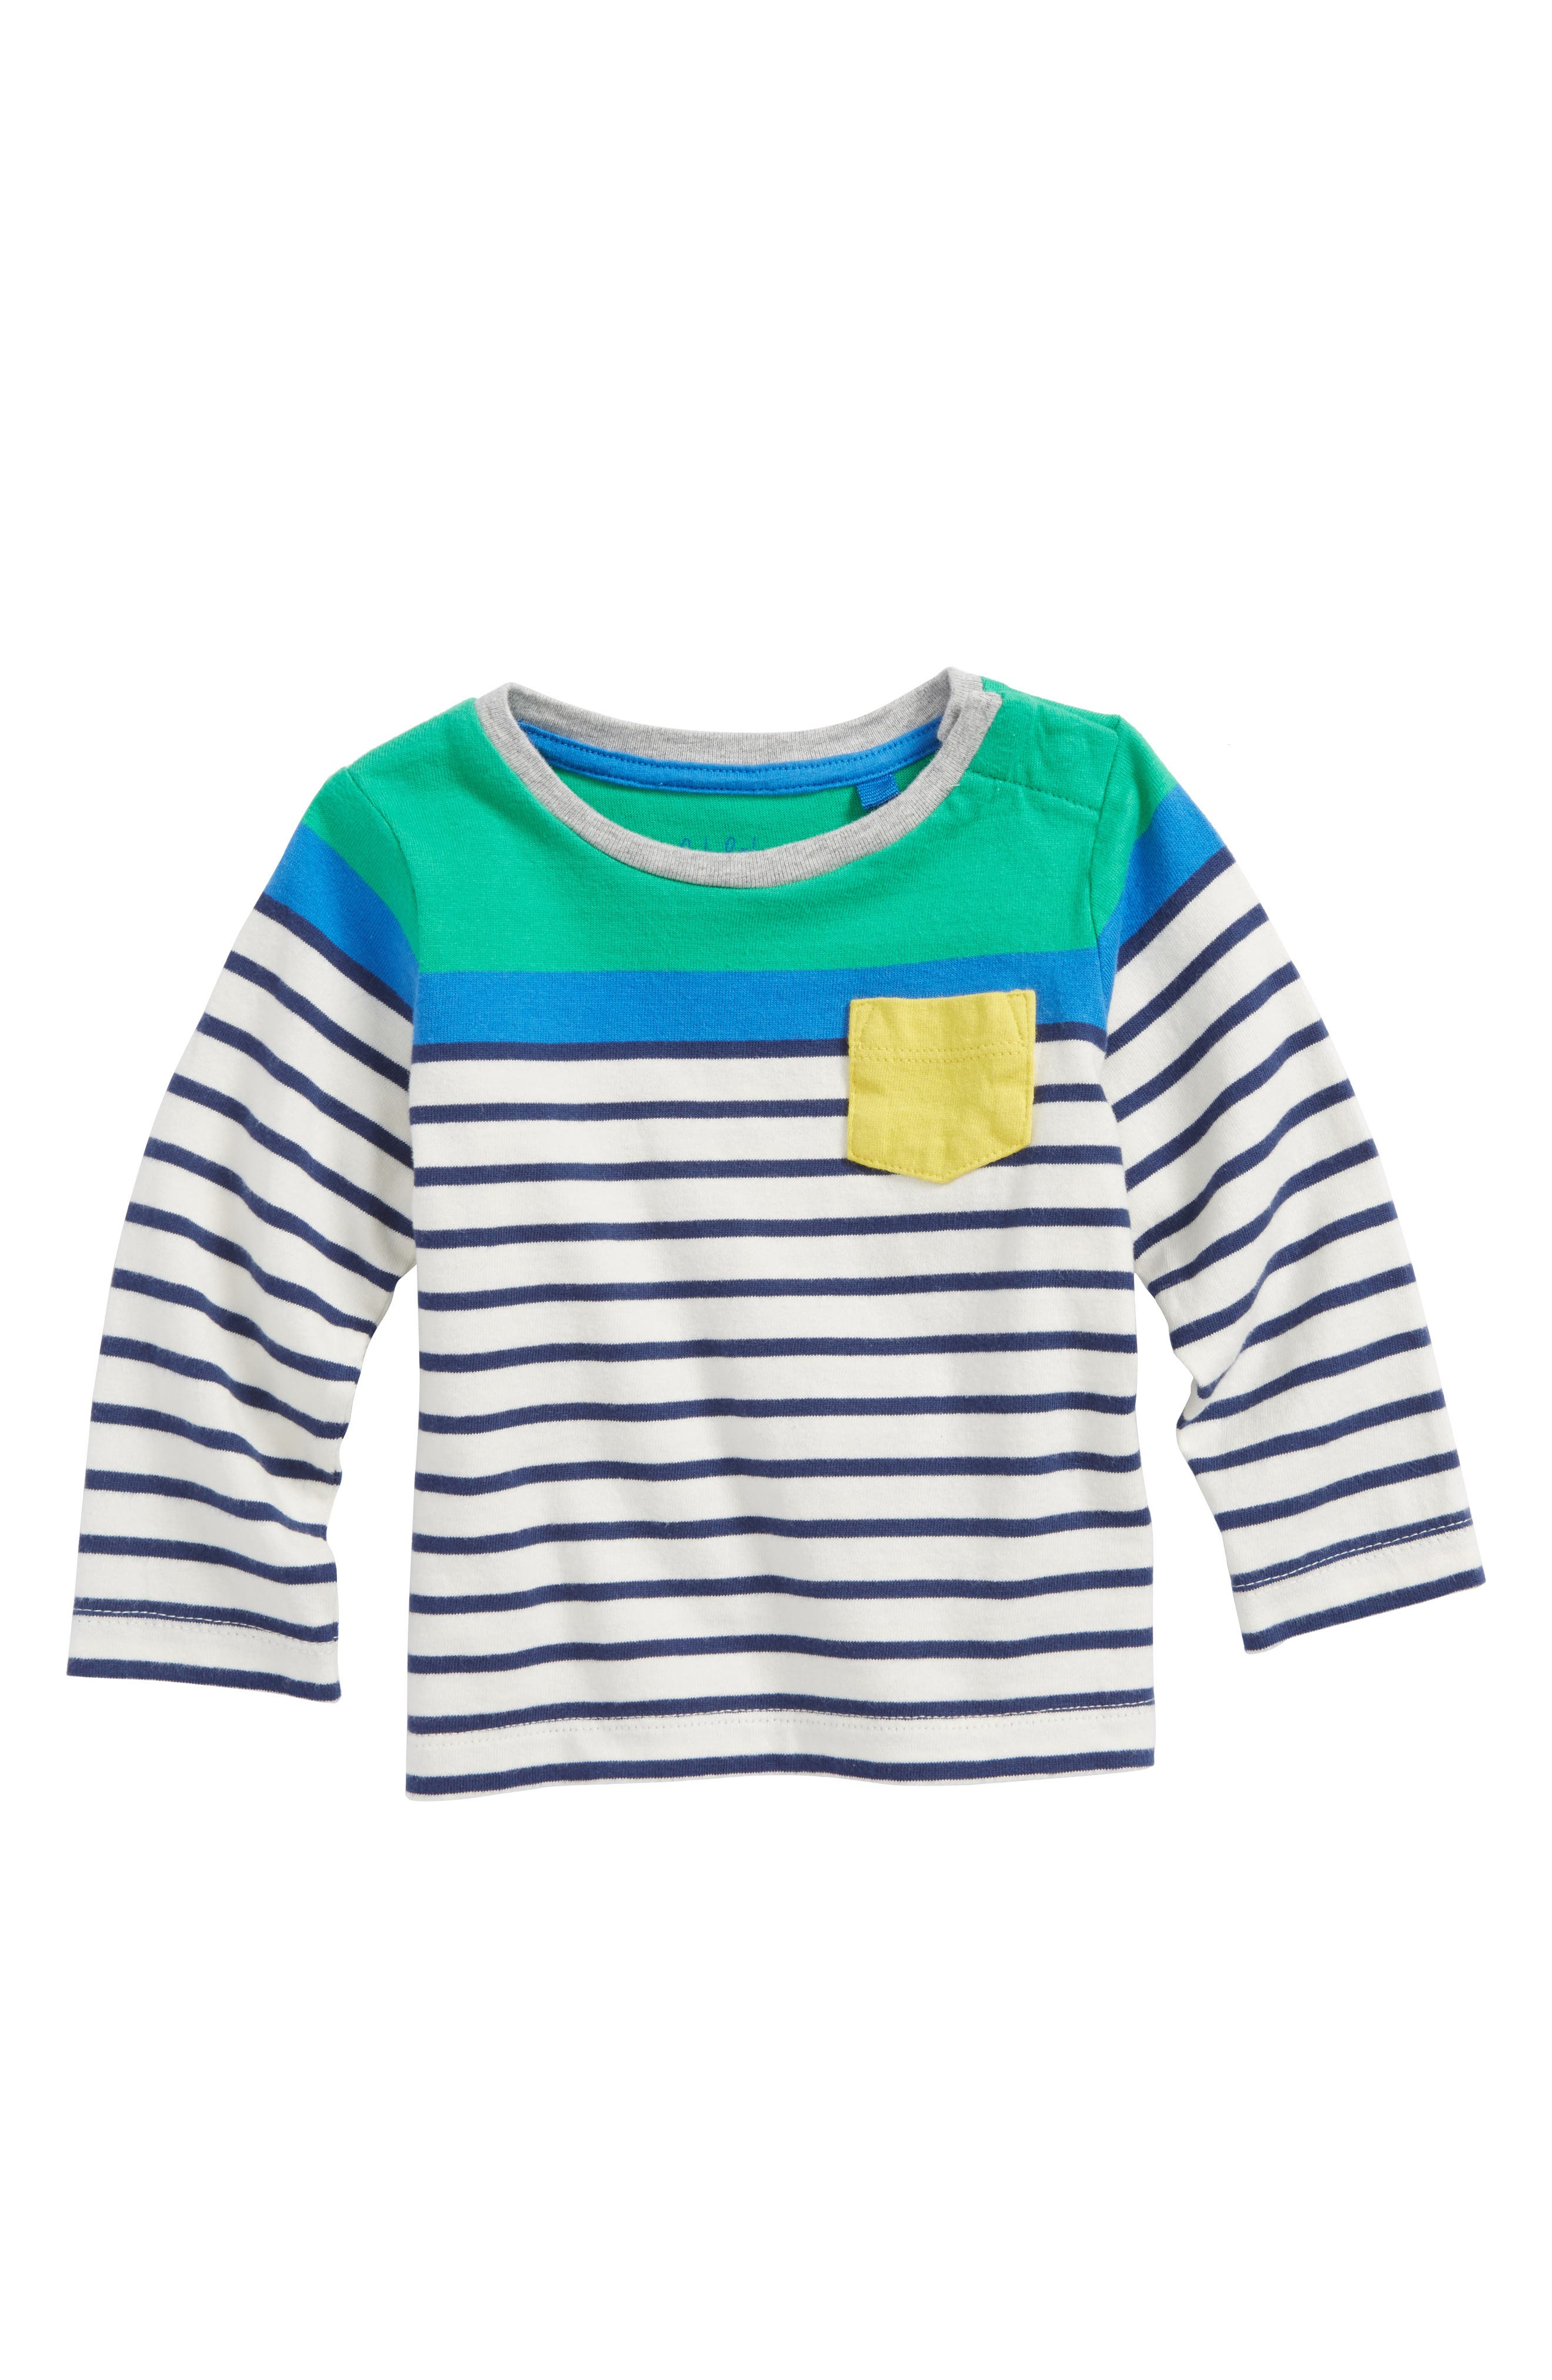 MINI BODEN Fun Breton T-Shirt, Main, color, 315